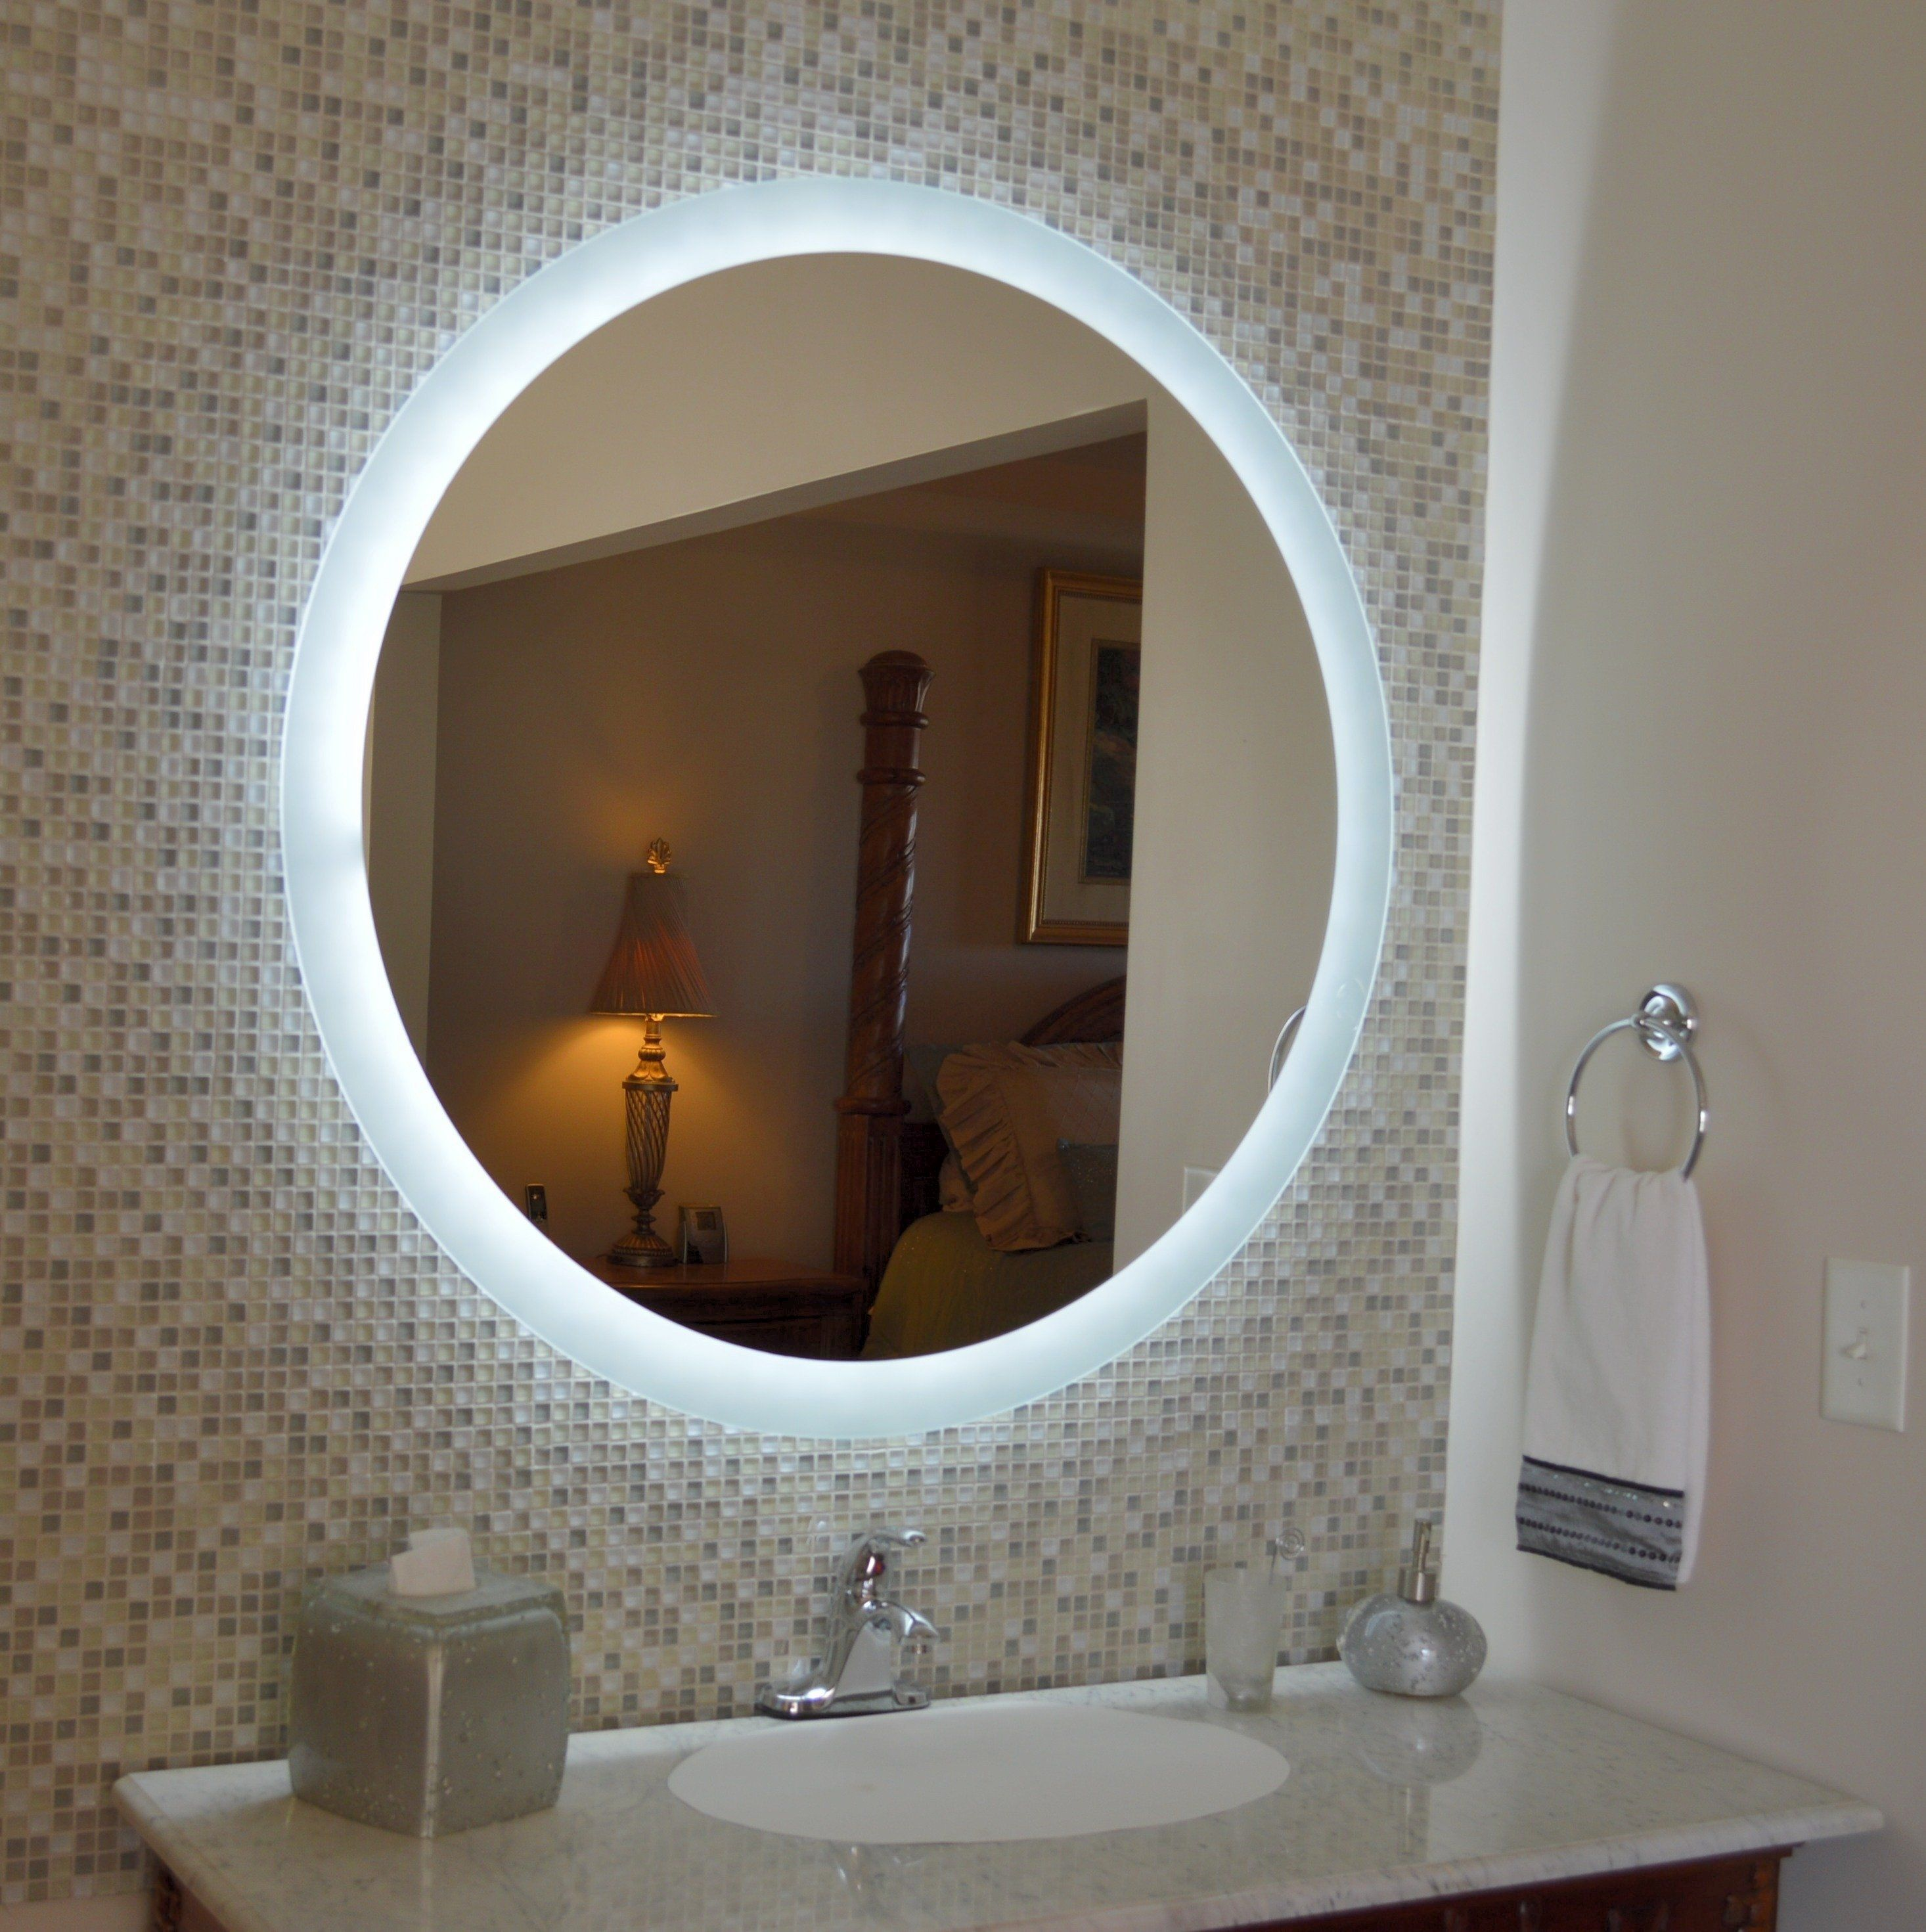 Side Lighted Led Bathroom Vanity Mirror 40 Wide X 40 Tall